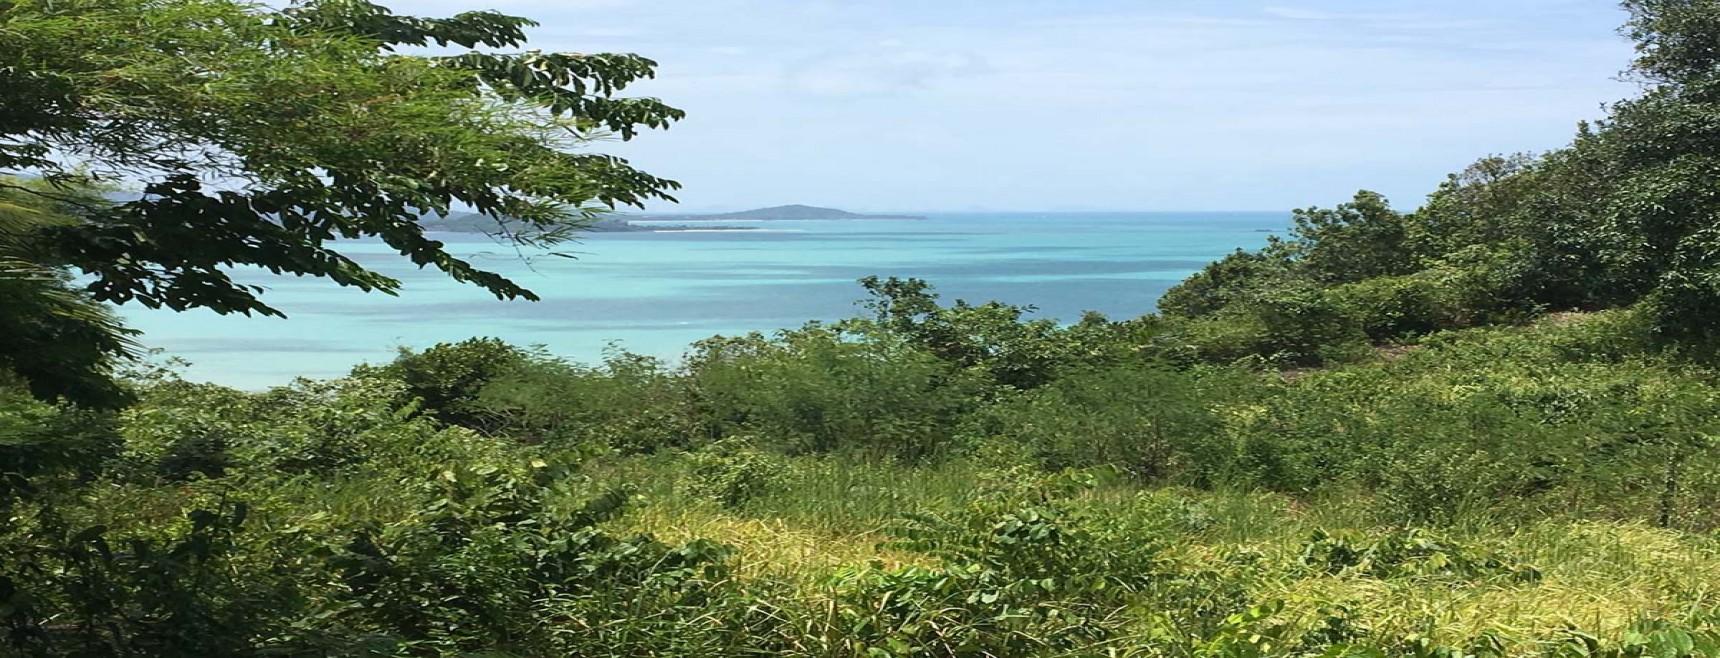 4 Rai Sea View Land Plai Laem Koh Samui (Thai-Real.com)